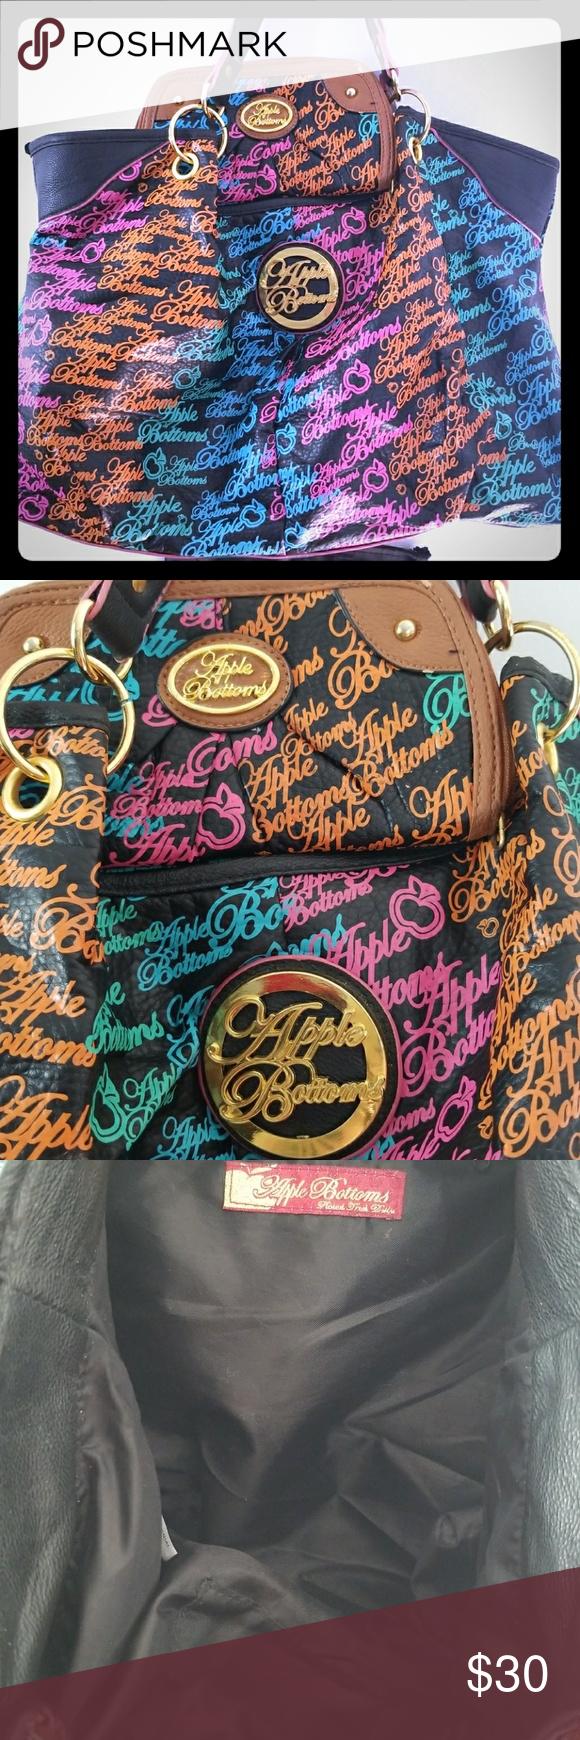 Applebottom handbag matching wallet shoulder bags spring summer